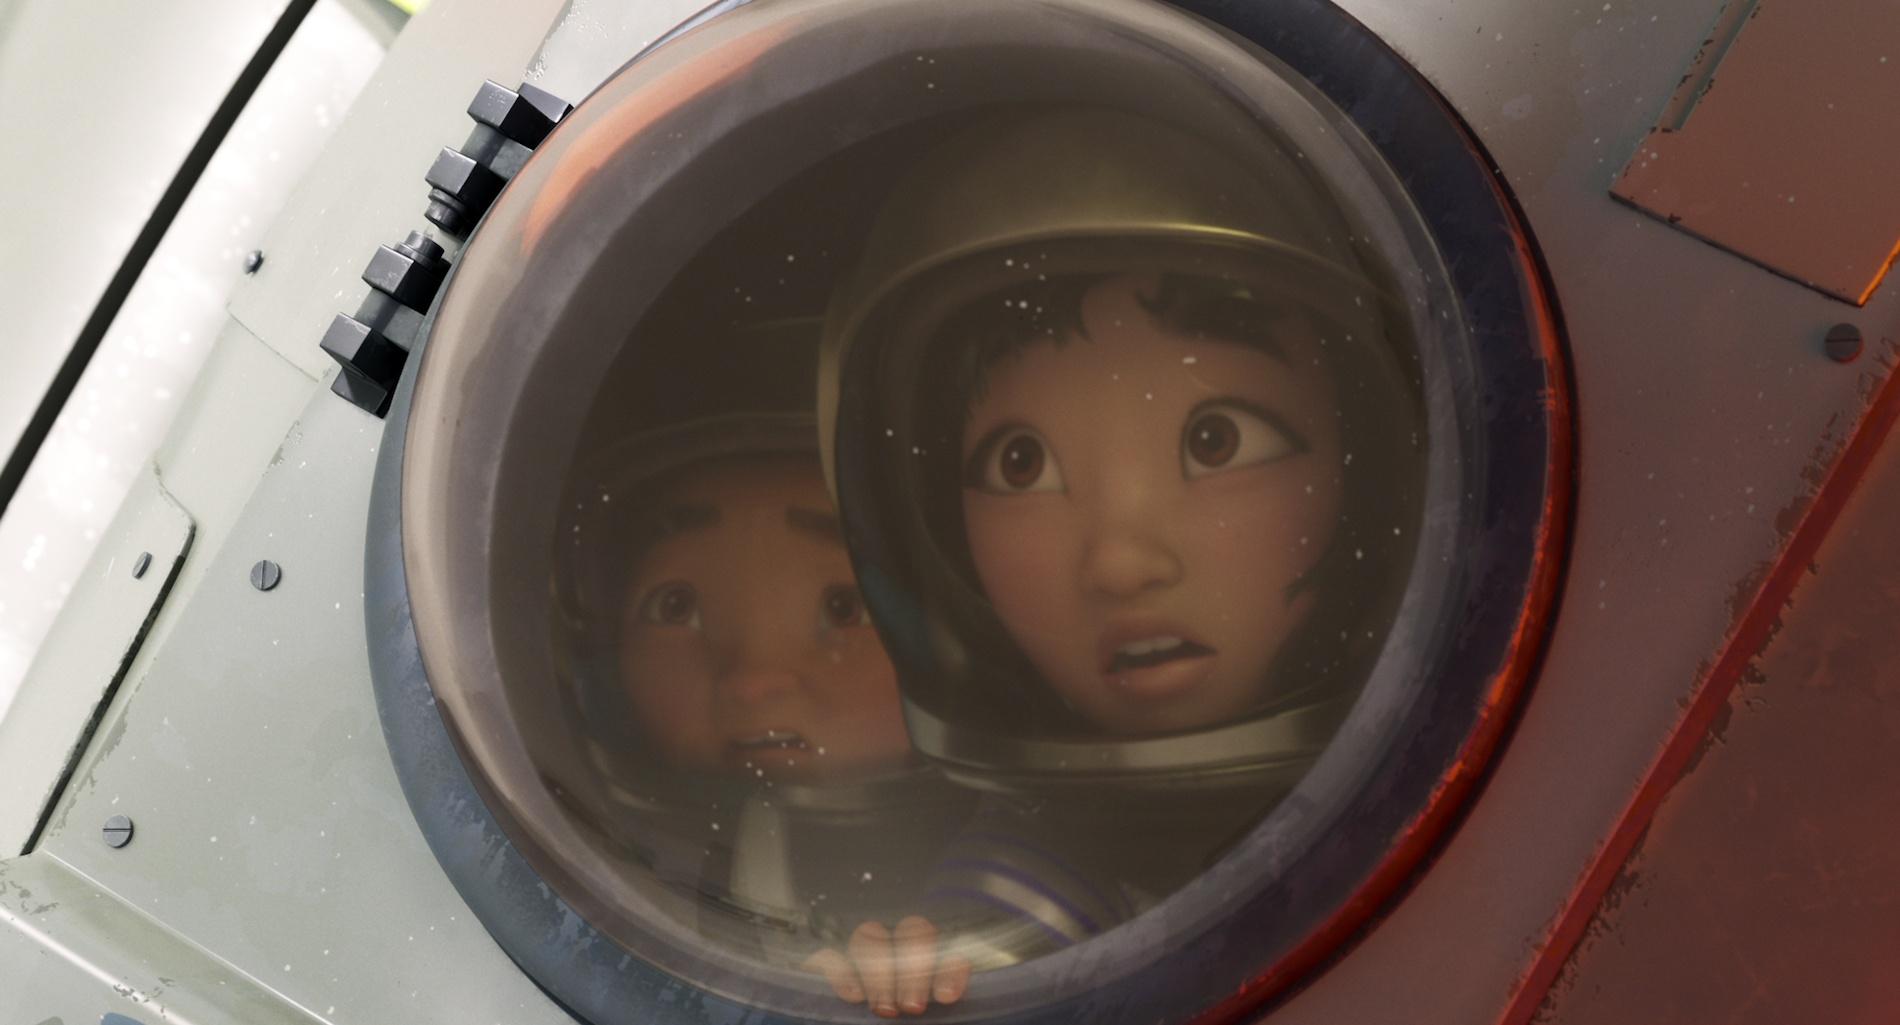 How Disney Animation Legend Glen Keane Finds Magic in Everyday Life